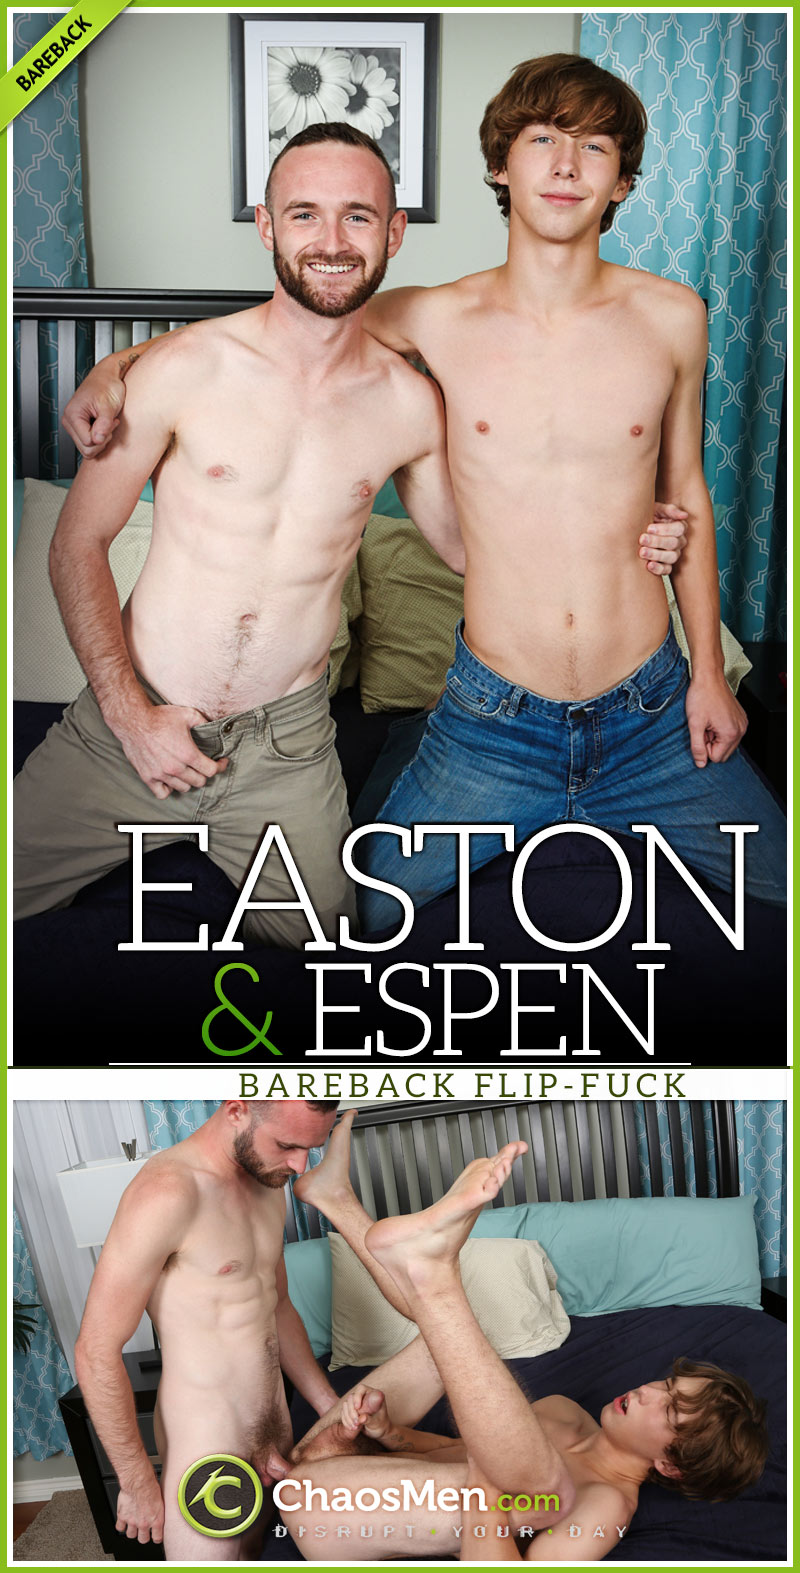 Easton and Espen Flip-Fuck at ChaosMen